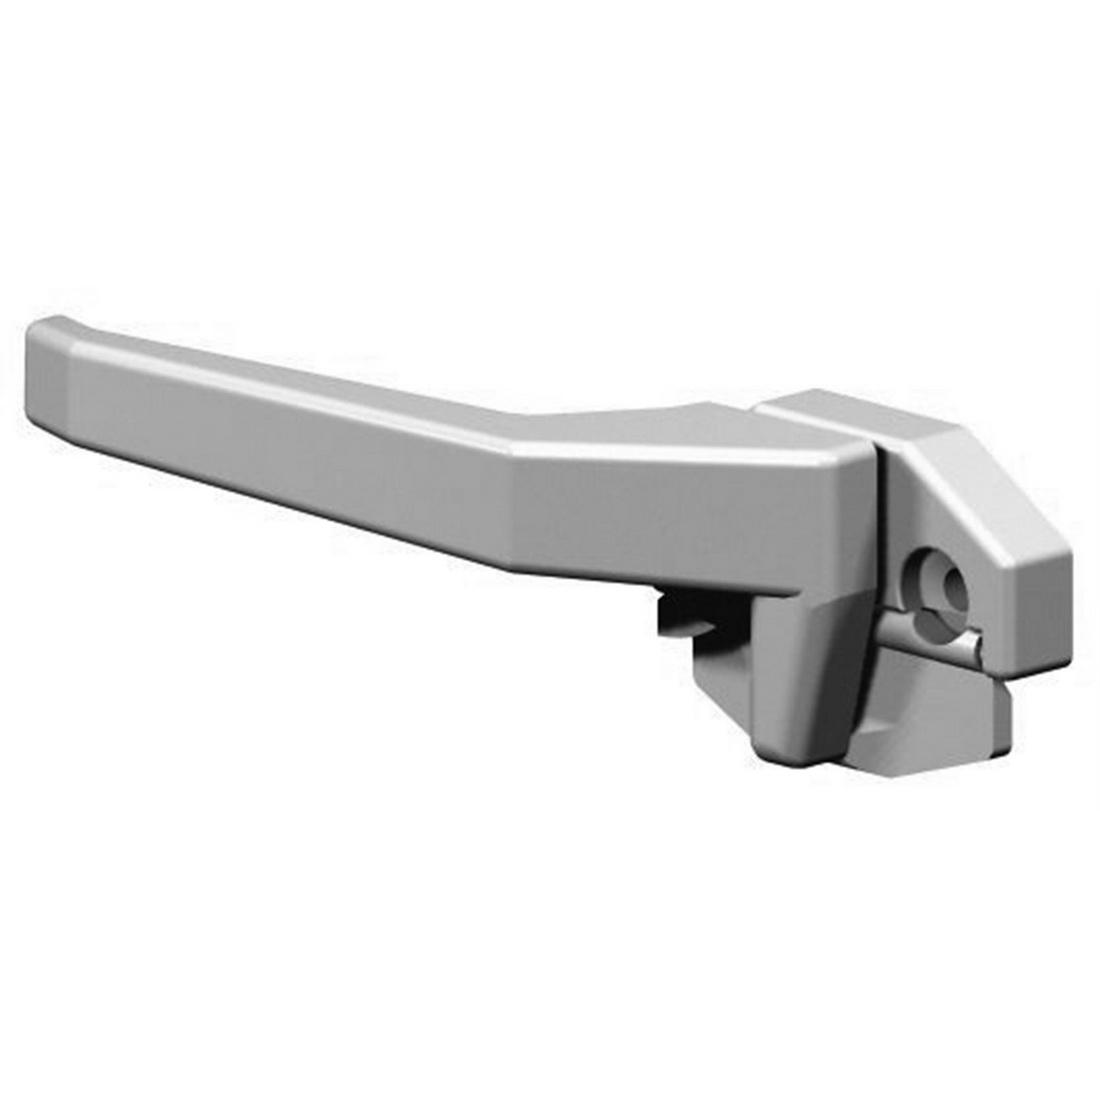 Securicraft Left Hand High Profile - Face Fix Wedgeless Window Handle 93mm Aluminum Frame Black MC331B